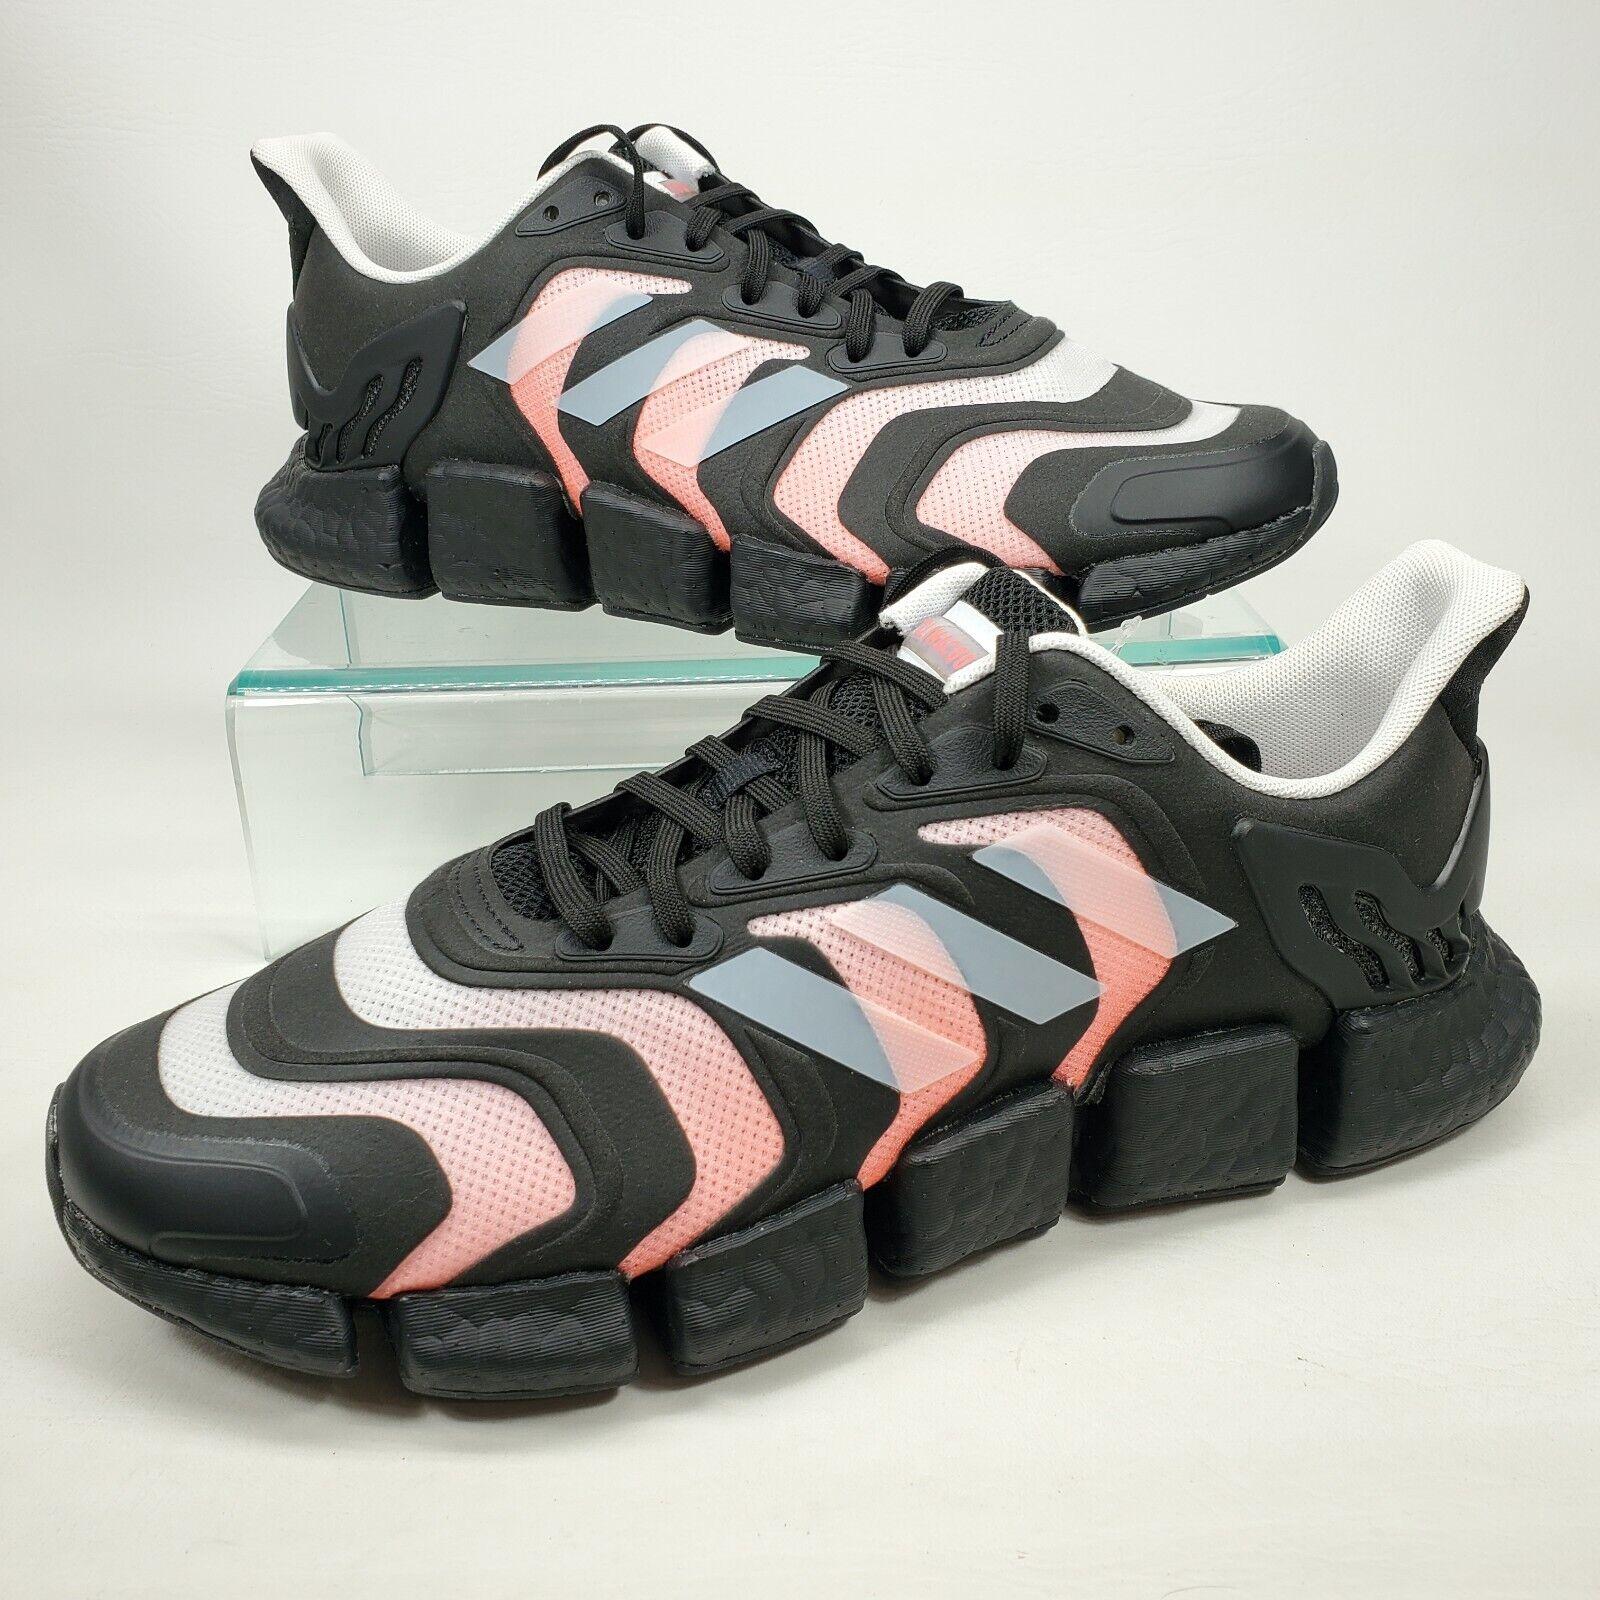 Size 11.5 - adidas Climacool Vento Black Signal Pink 2020